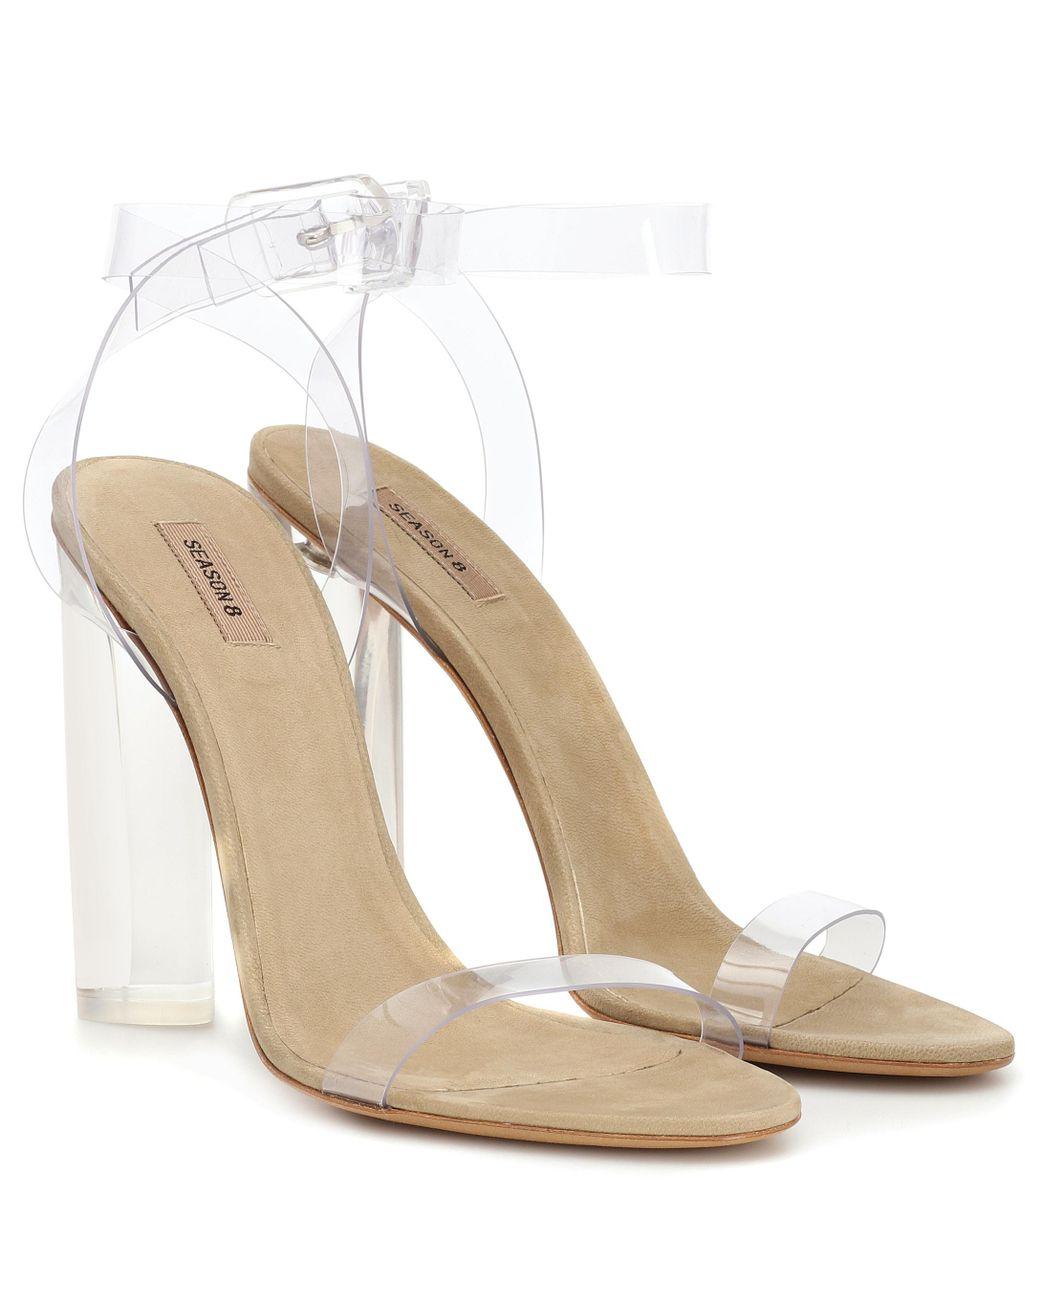 Sandalias 8De Transparentesseason En Mytheresa Mujer Exclusivo 7gb6yYf